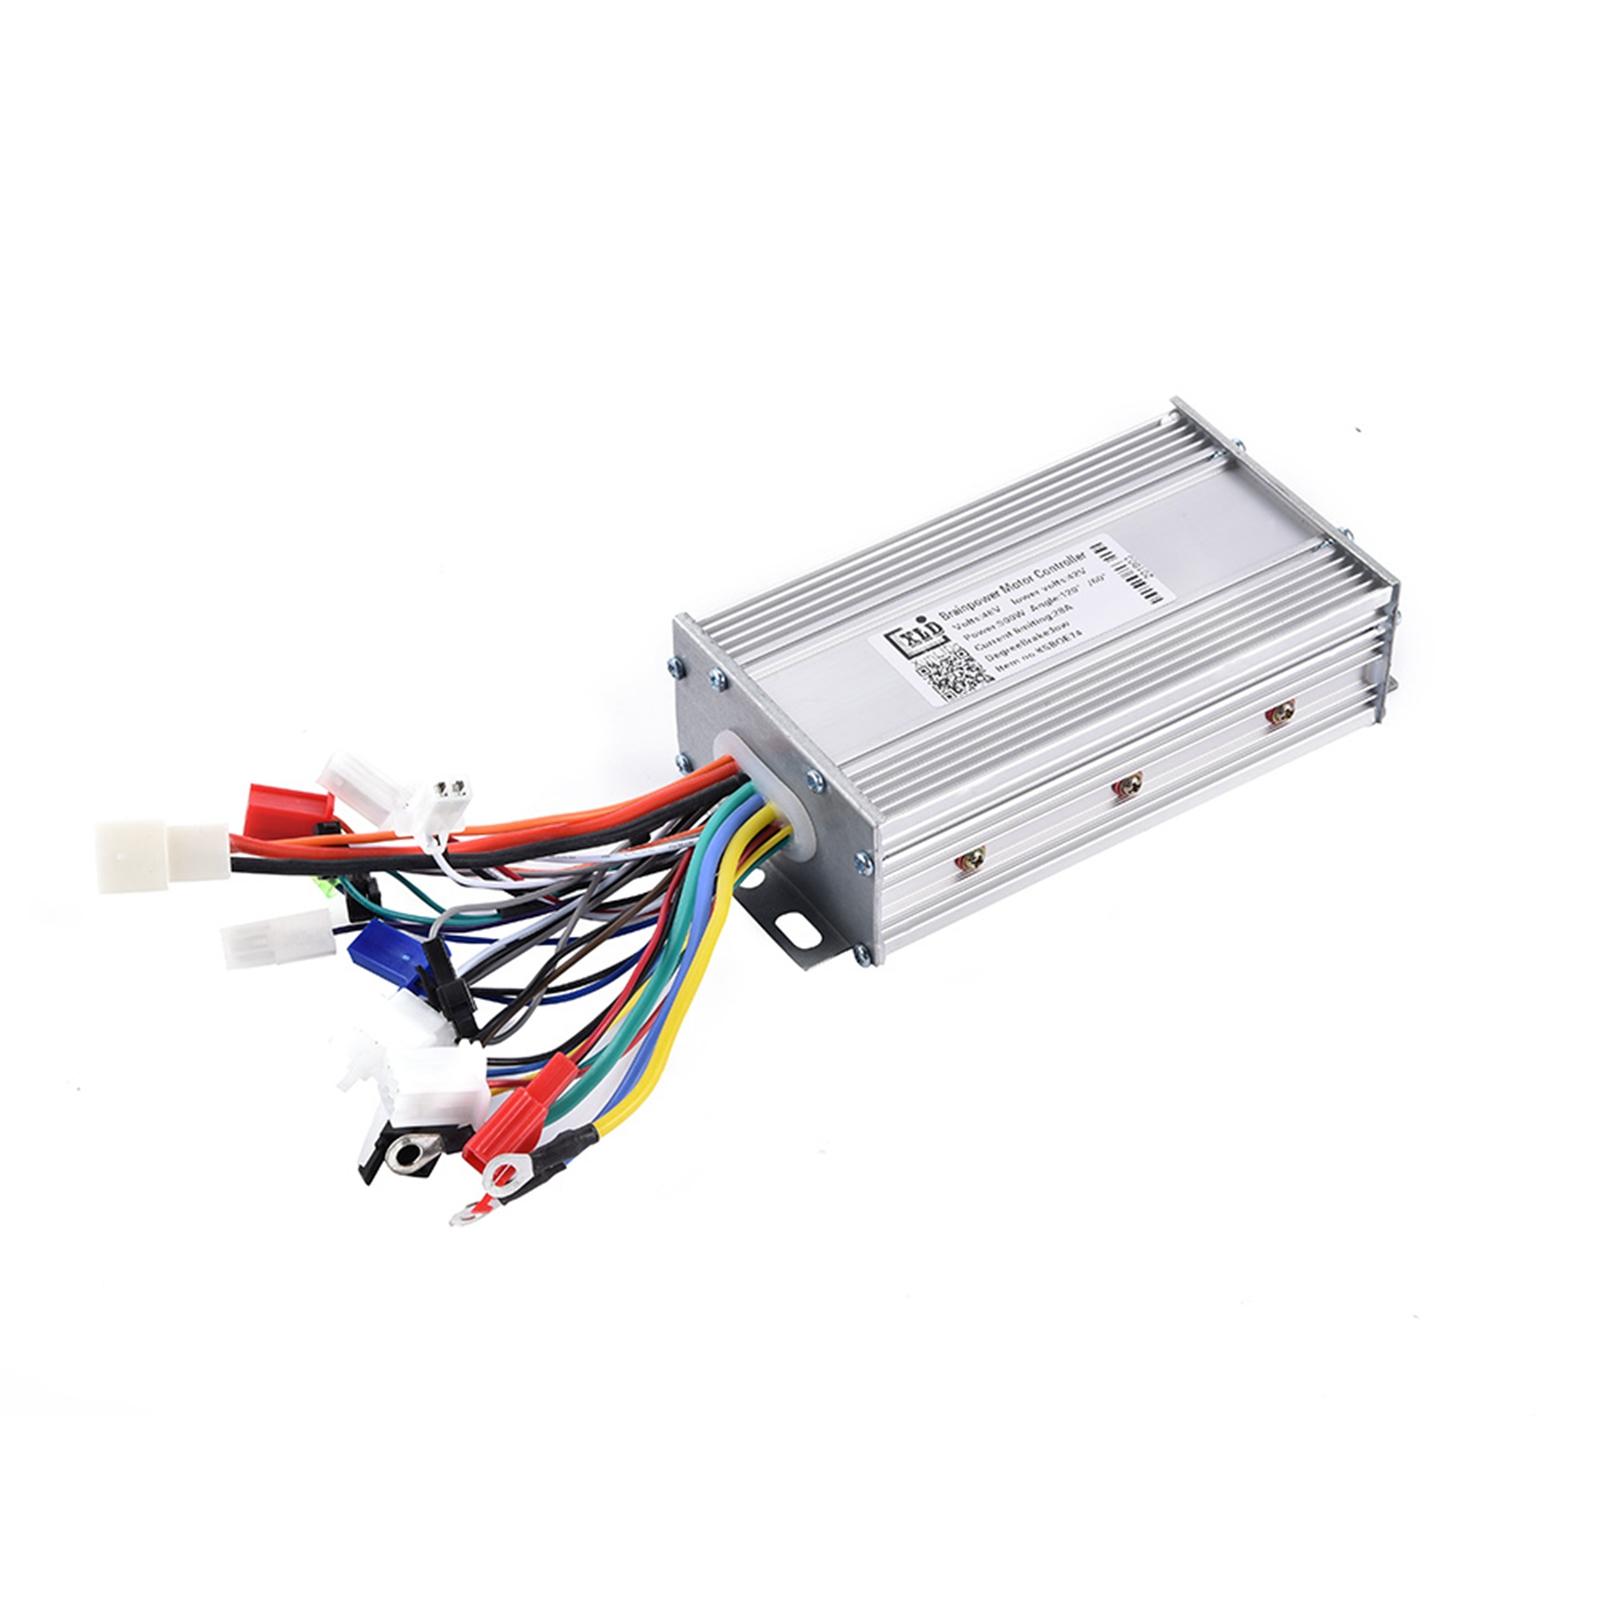 36V-48V-500W-1000W-E-bike-Vehicle-Scooter-Brushless-Motor-Speed-Controller-DY thumbnail 14